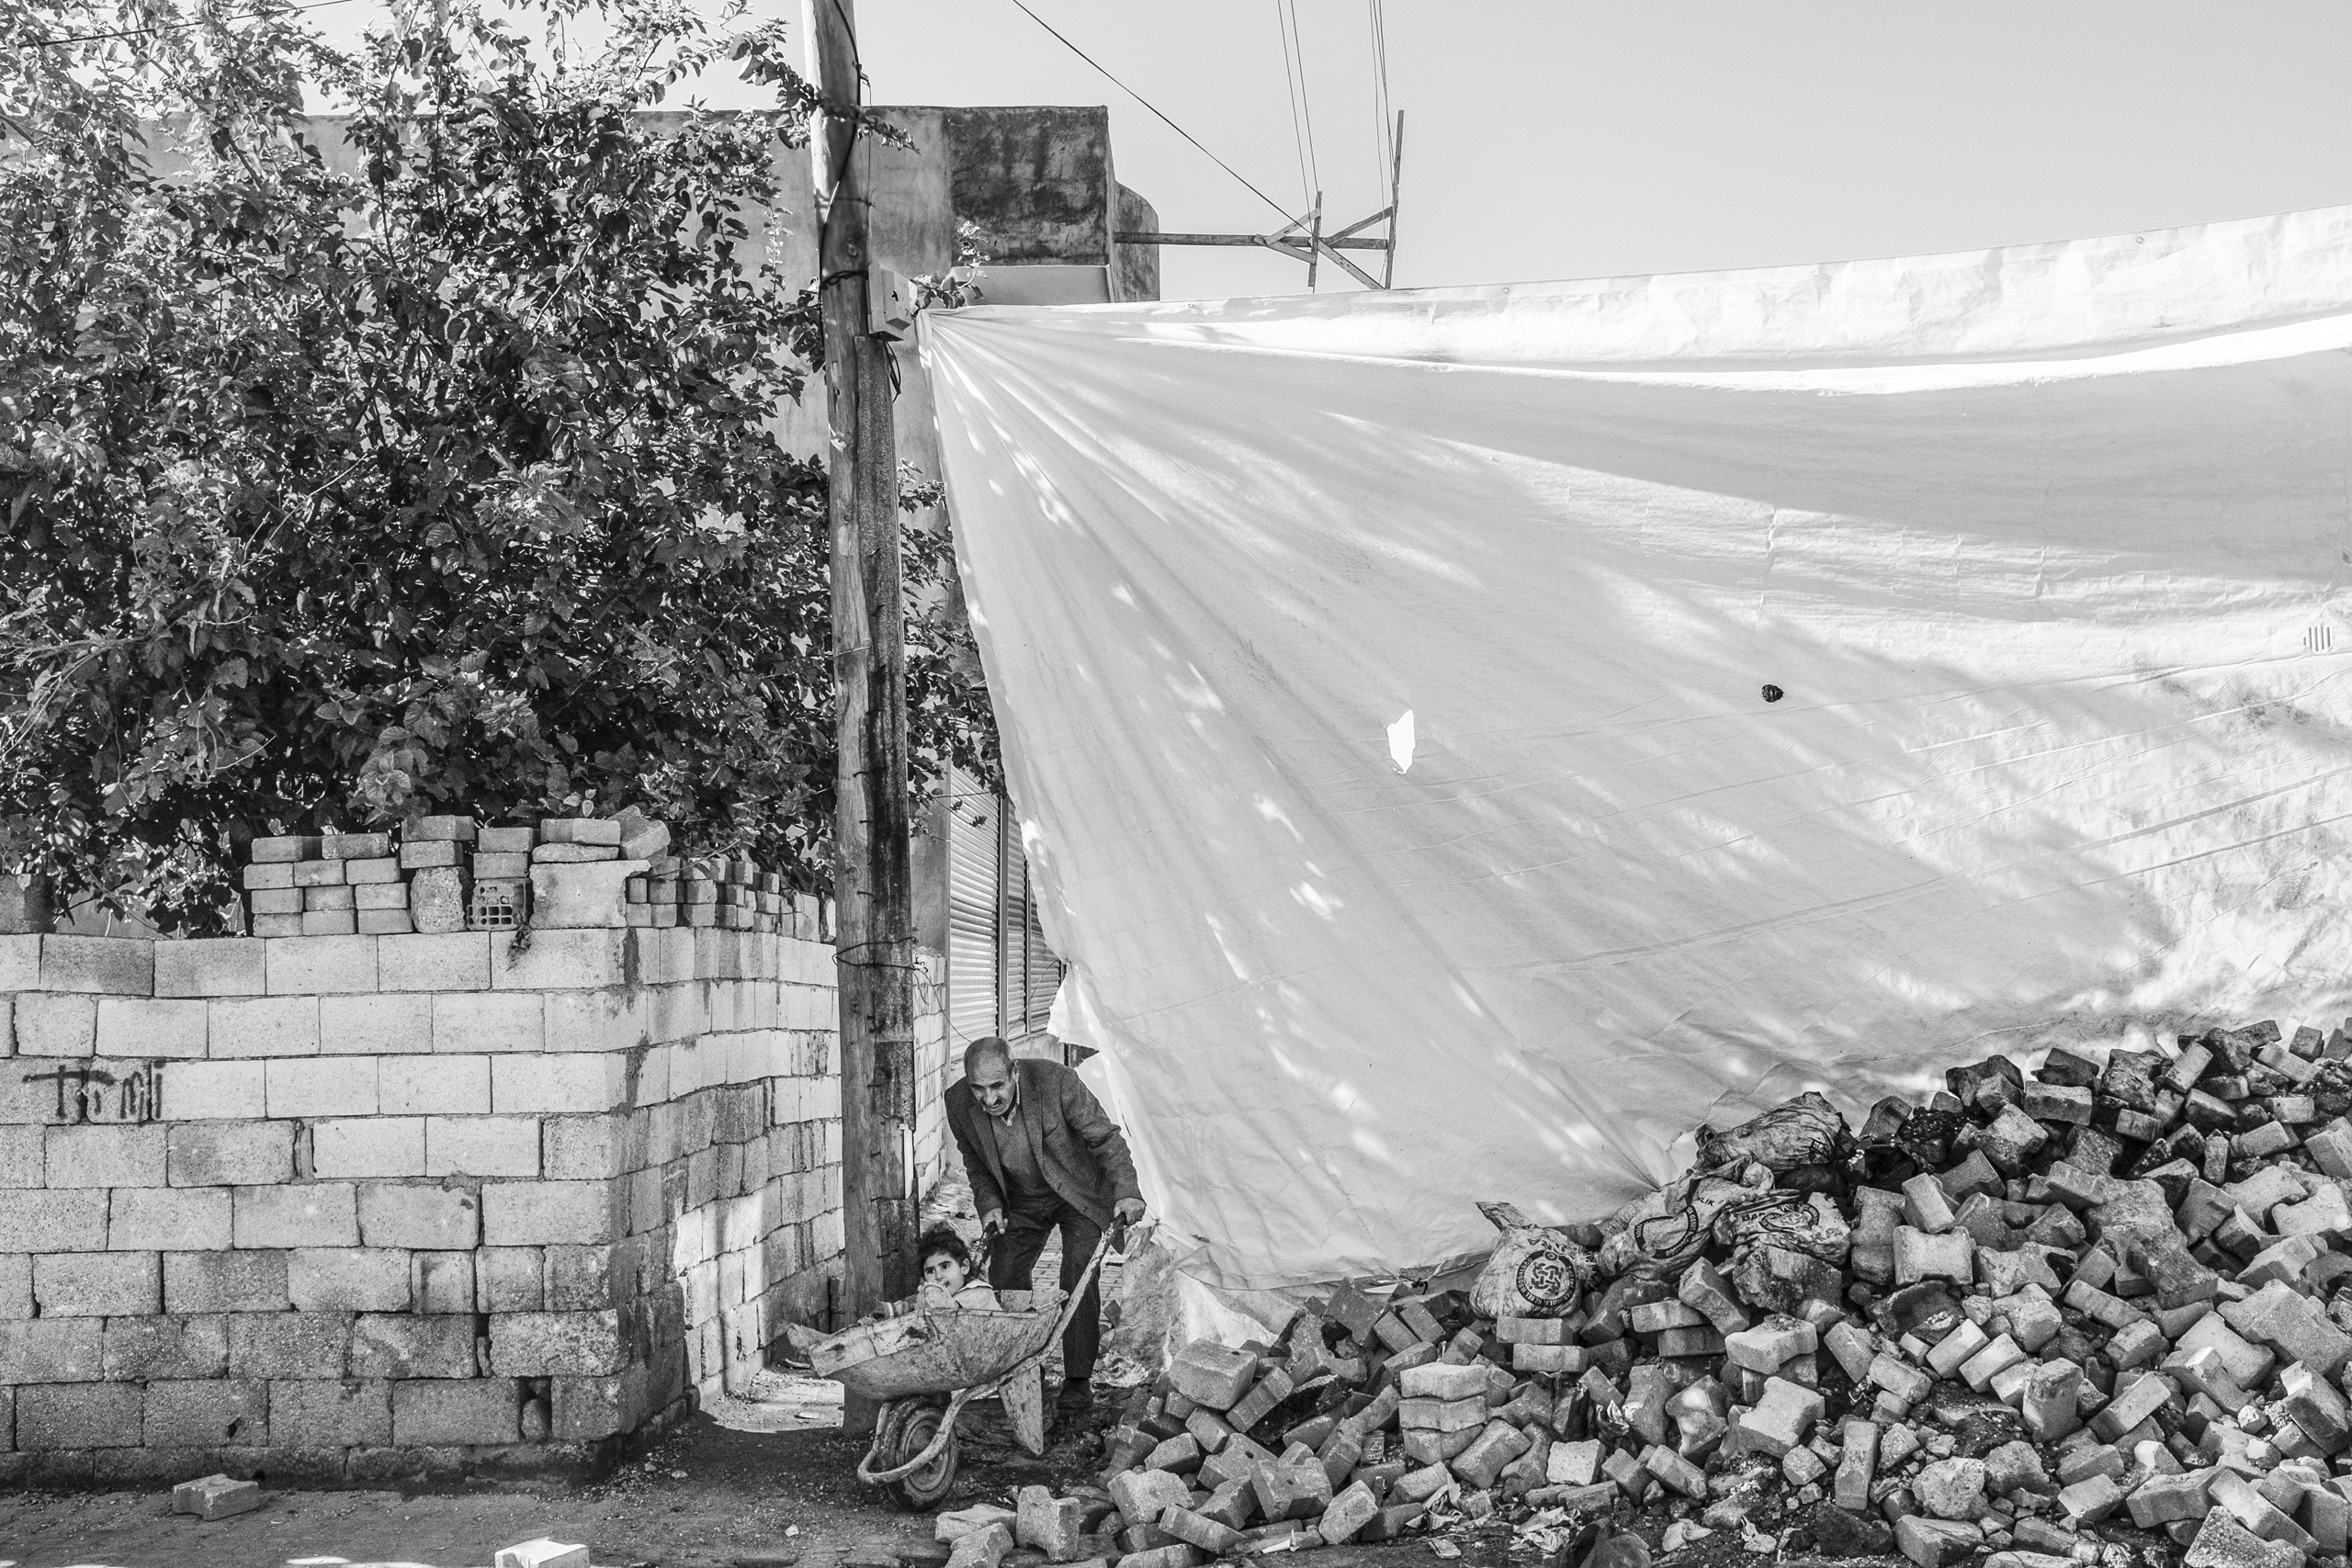 Walking past a make-shift barricade, a man carries his daughter to the hospital in a wheelbarrow, Nusaybin, Turkey, Dec. 2015.